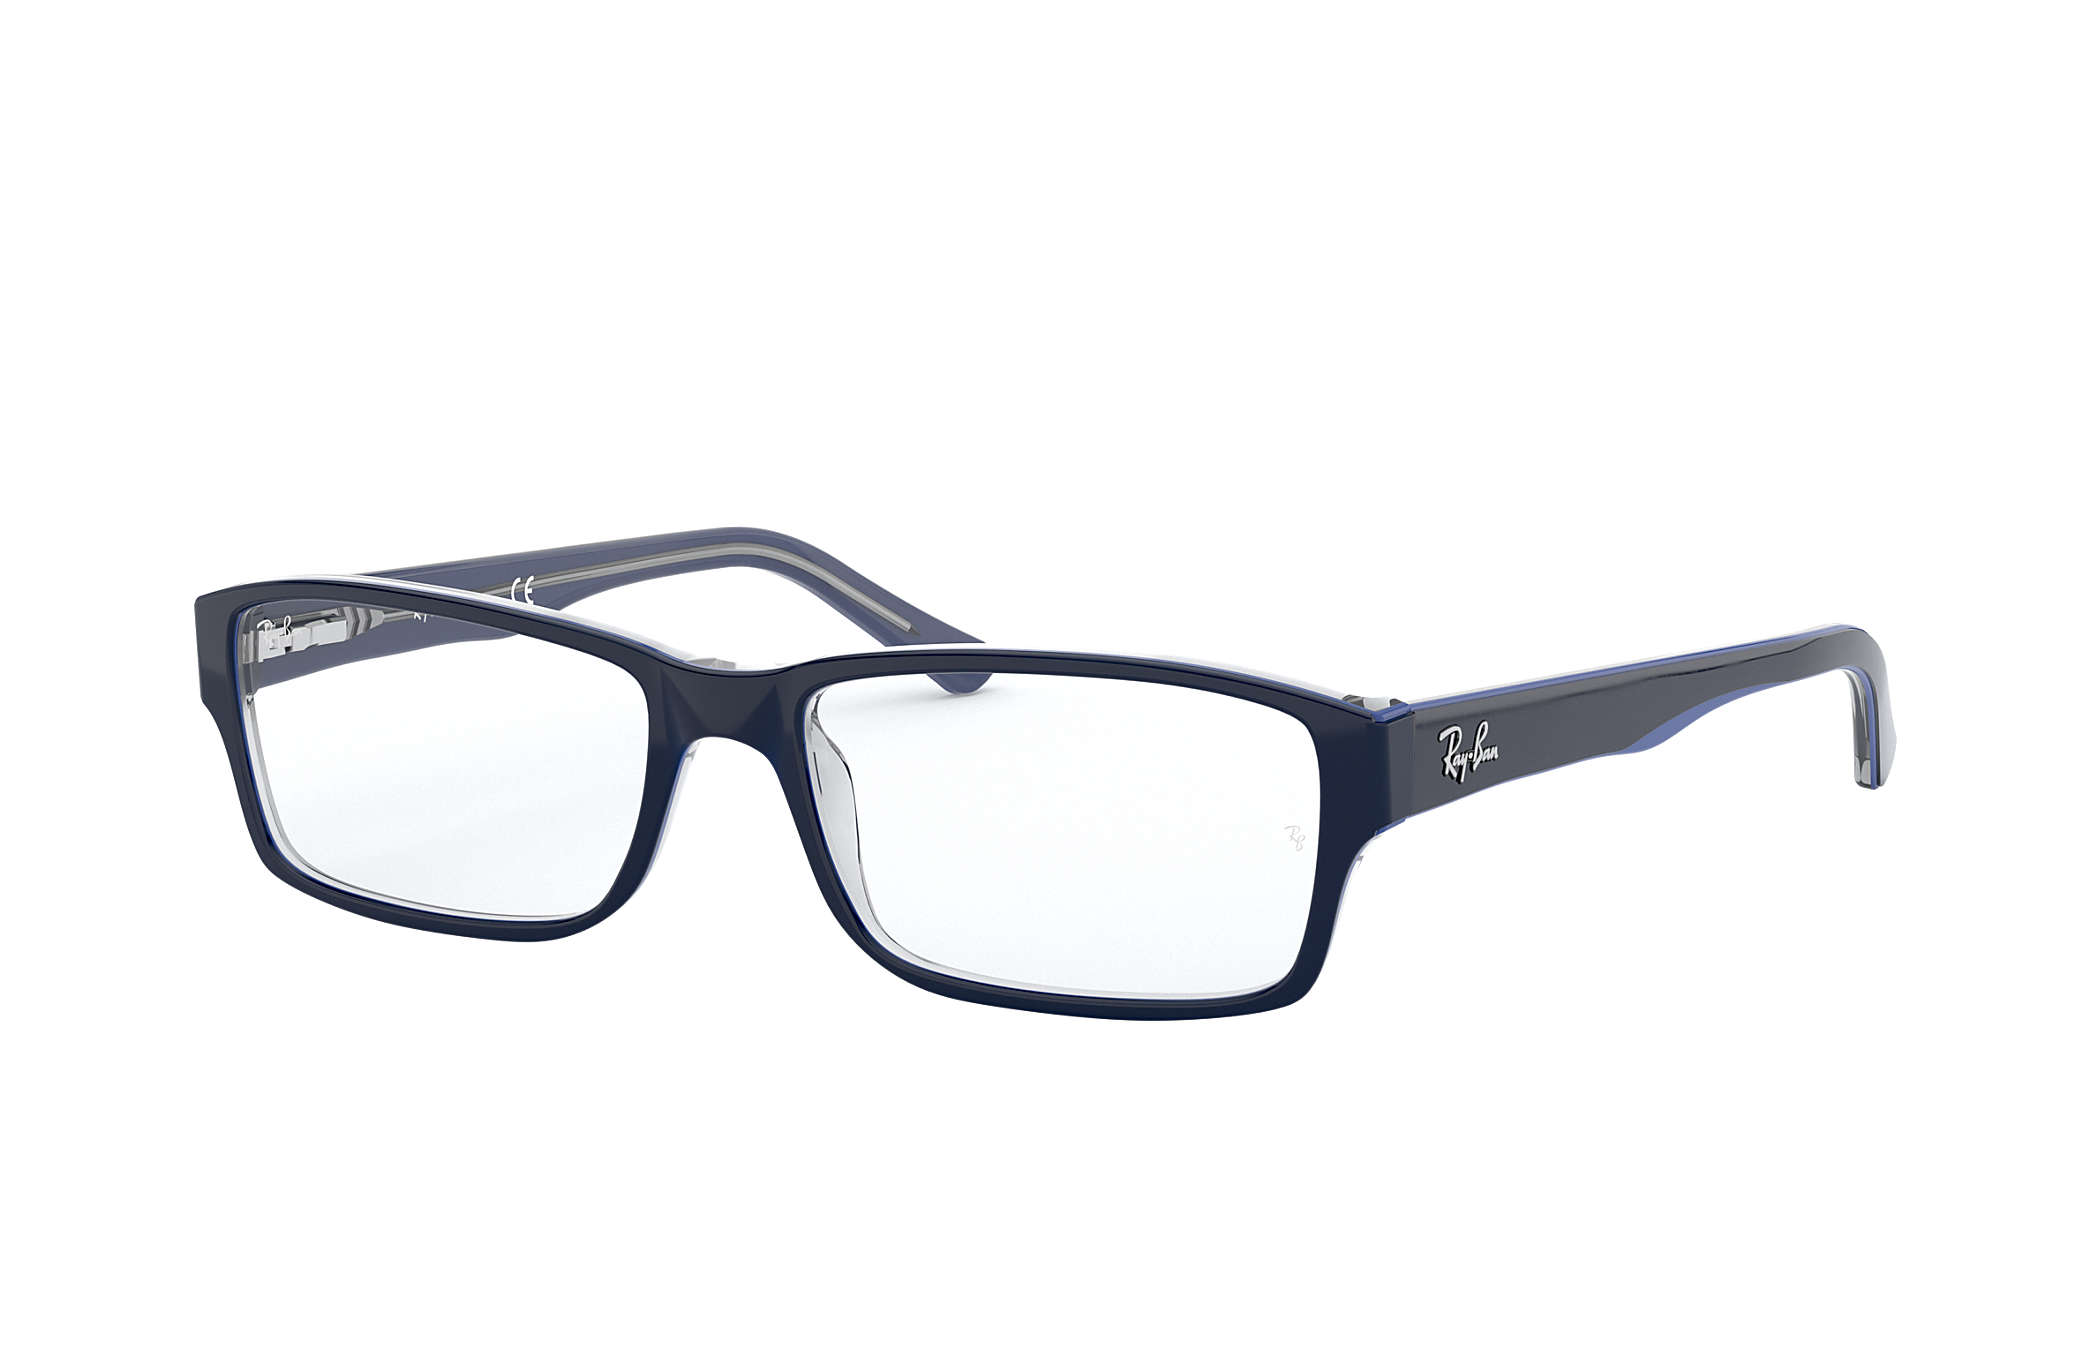 Glasögon Ray-Ban RB5169 Blå - Acetat - 0RX5169581552  07c20da5449c4